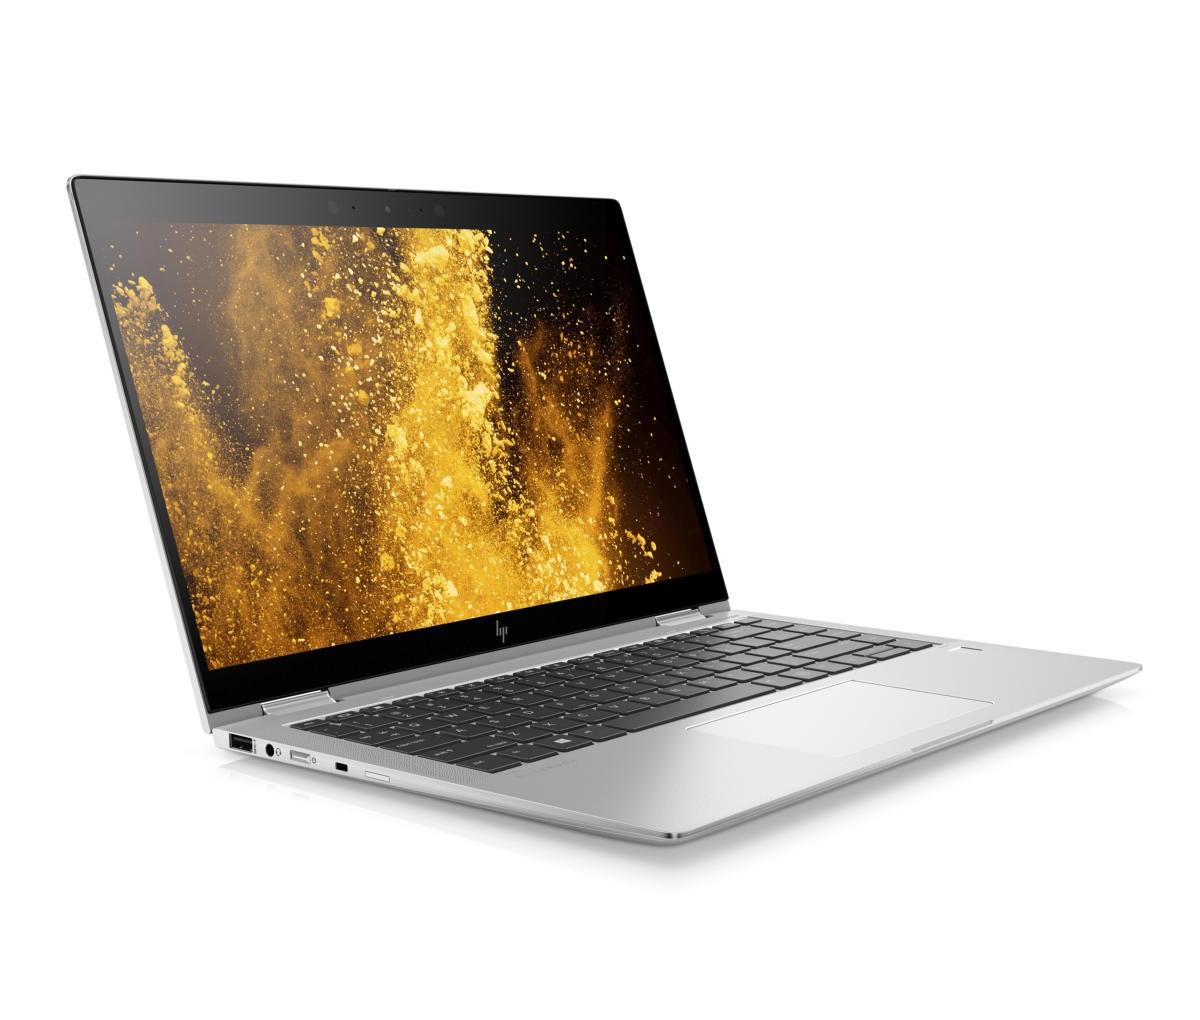 hp elitebook x360 1040 g6 coreset frontright